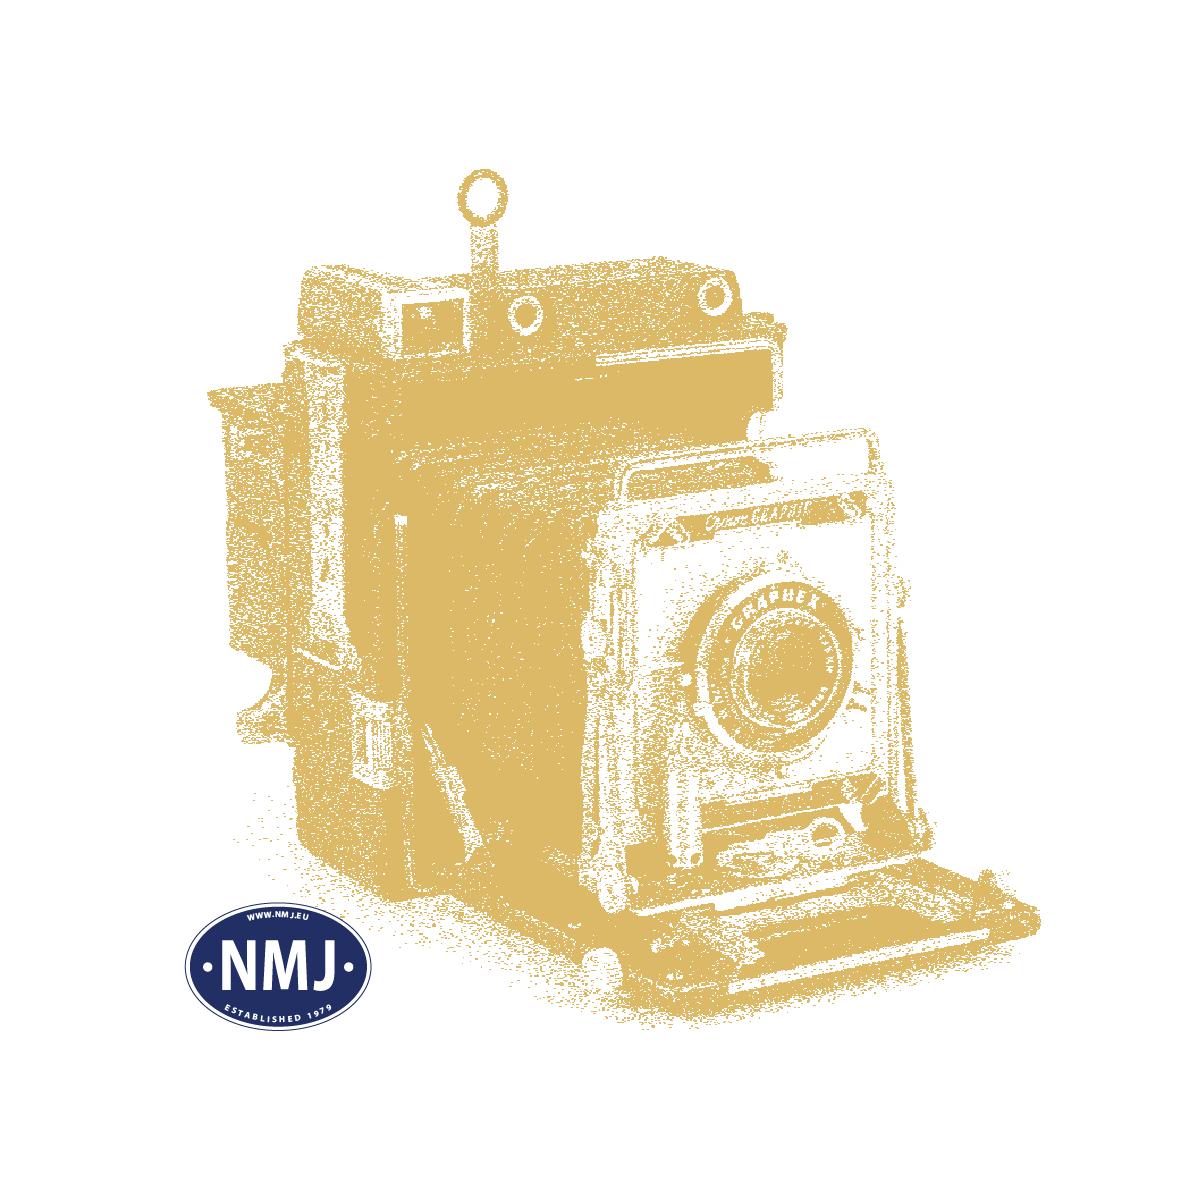 NMJE501440 - NMJ Exclusive SZD WLABm UIC Y, Kopenhagen-Moskau, Schlafwagen